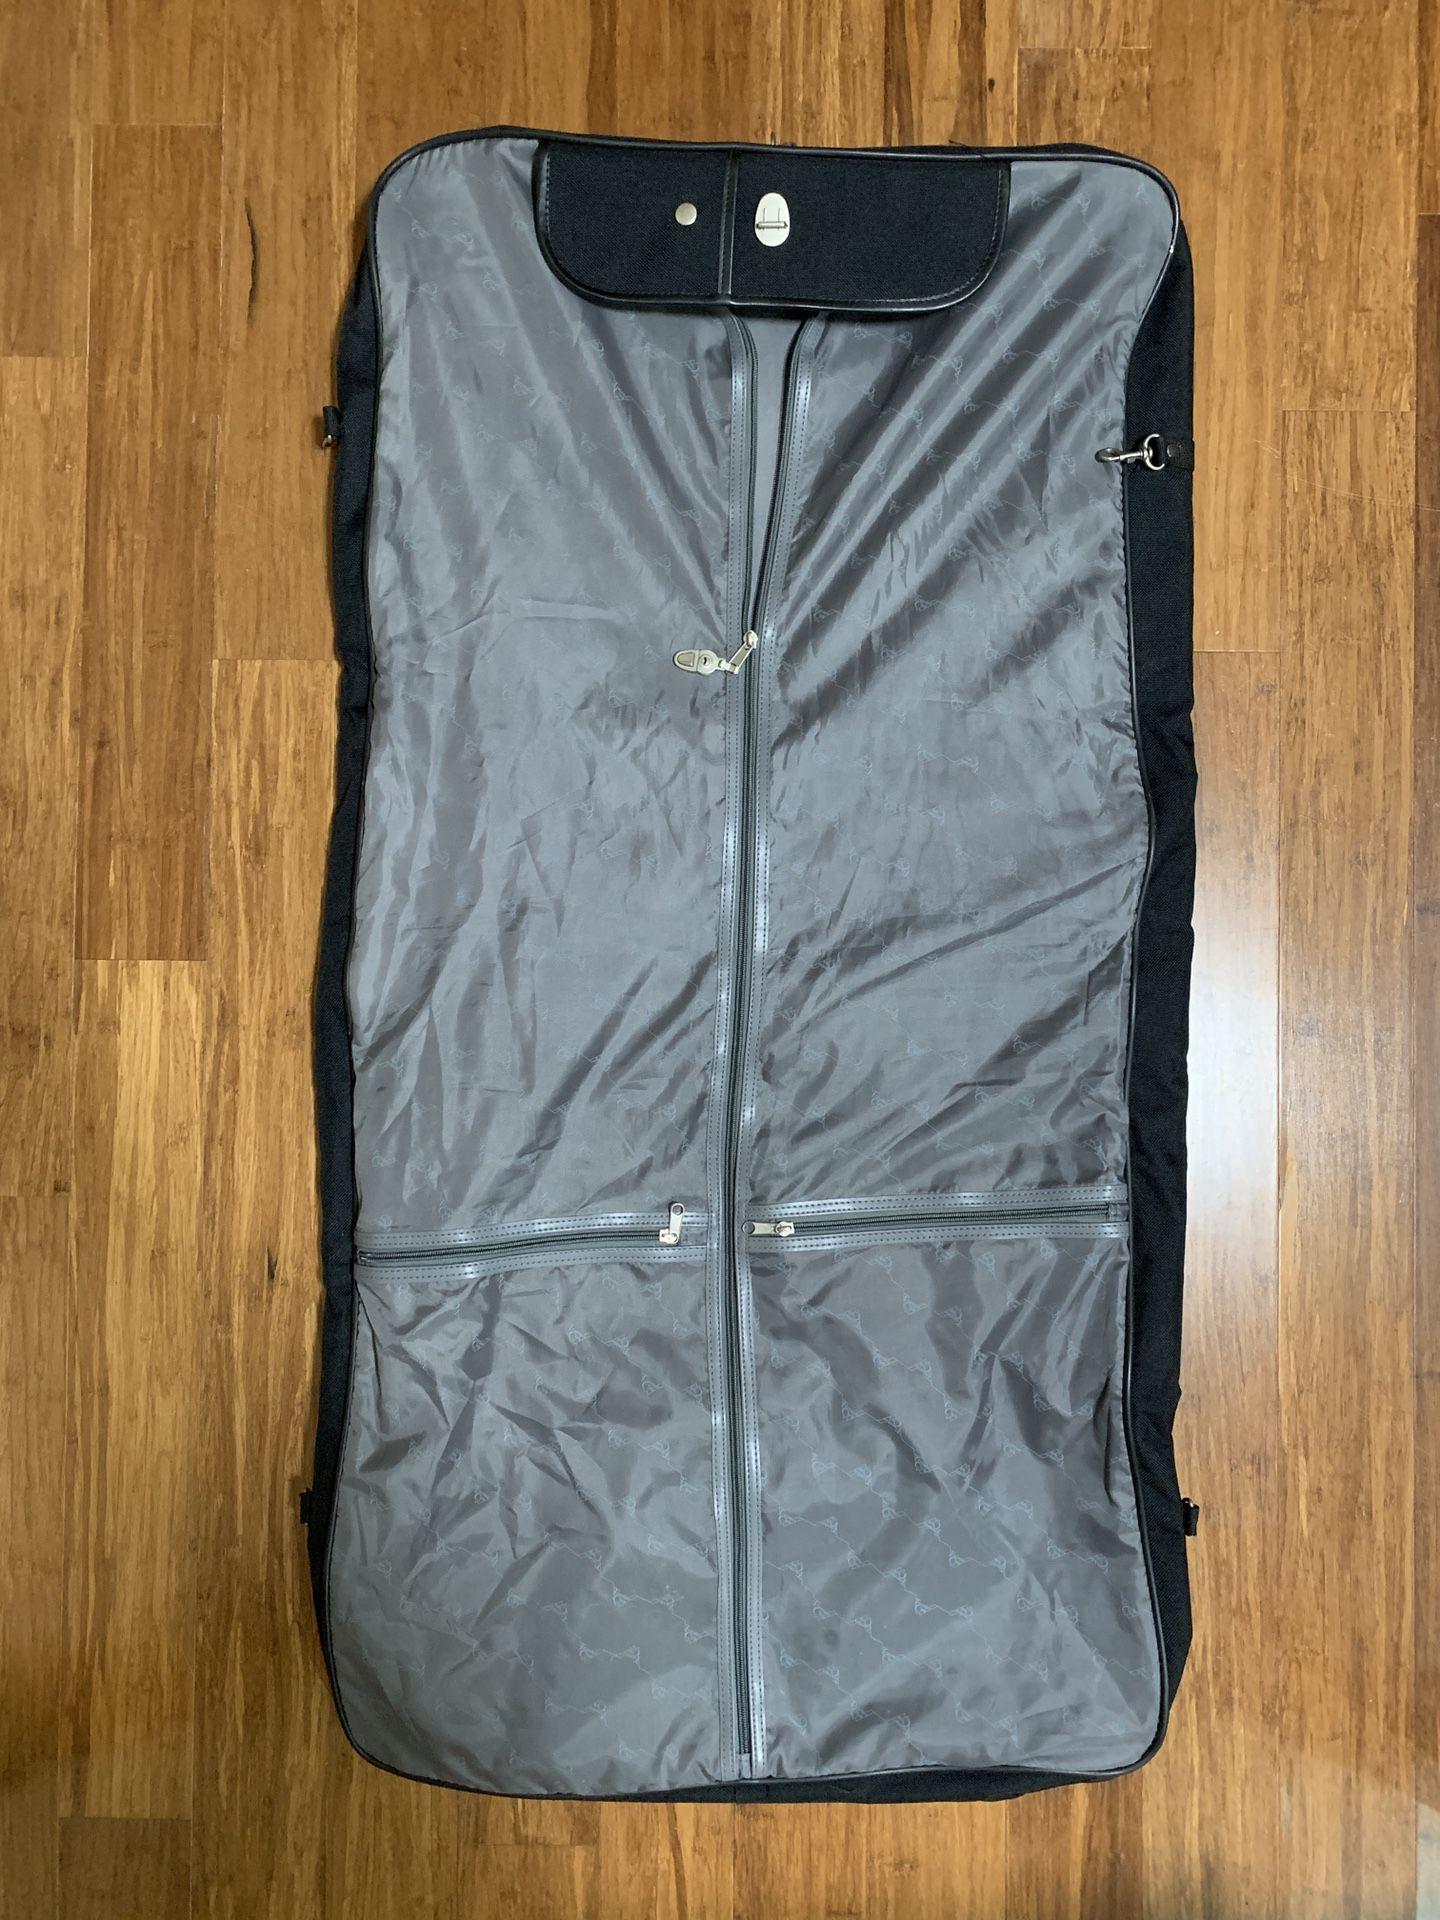 Travelers Club Garment Bag Folding Clothing Carrier  Travelers Club